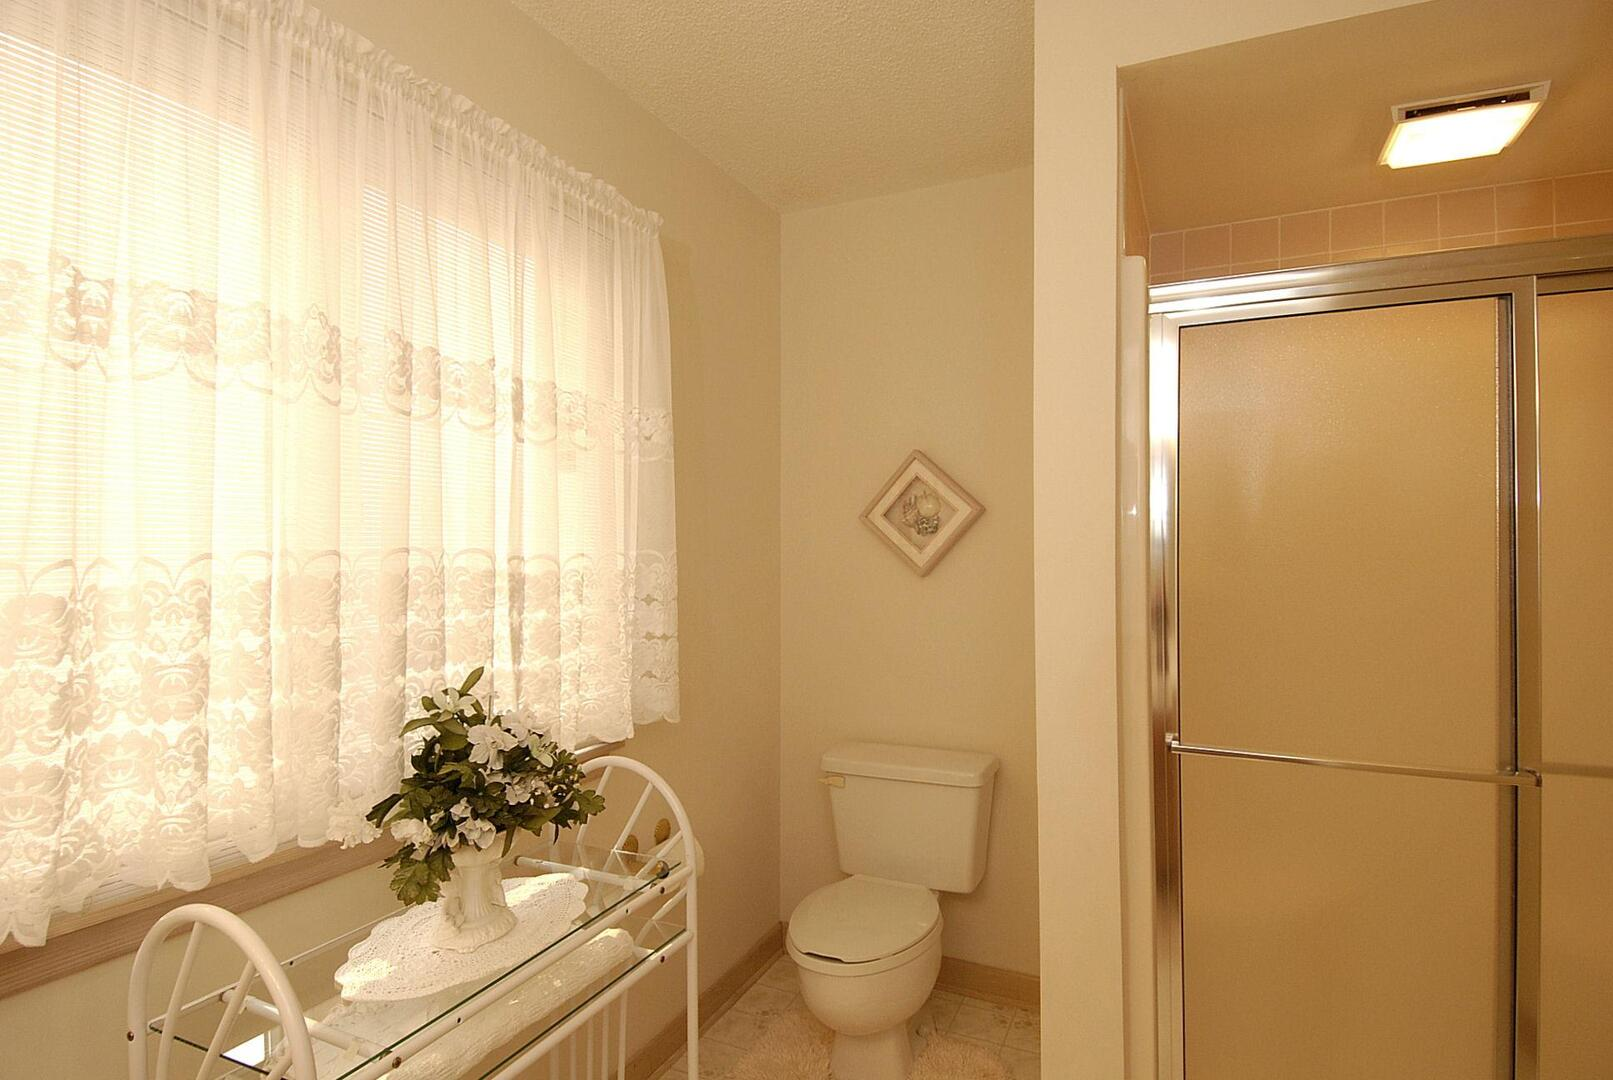 Middle/Entry Level,Bath,